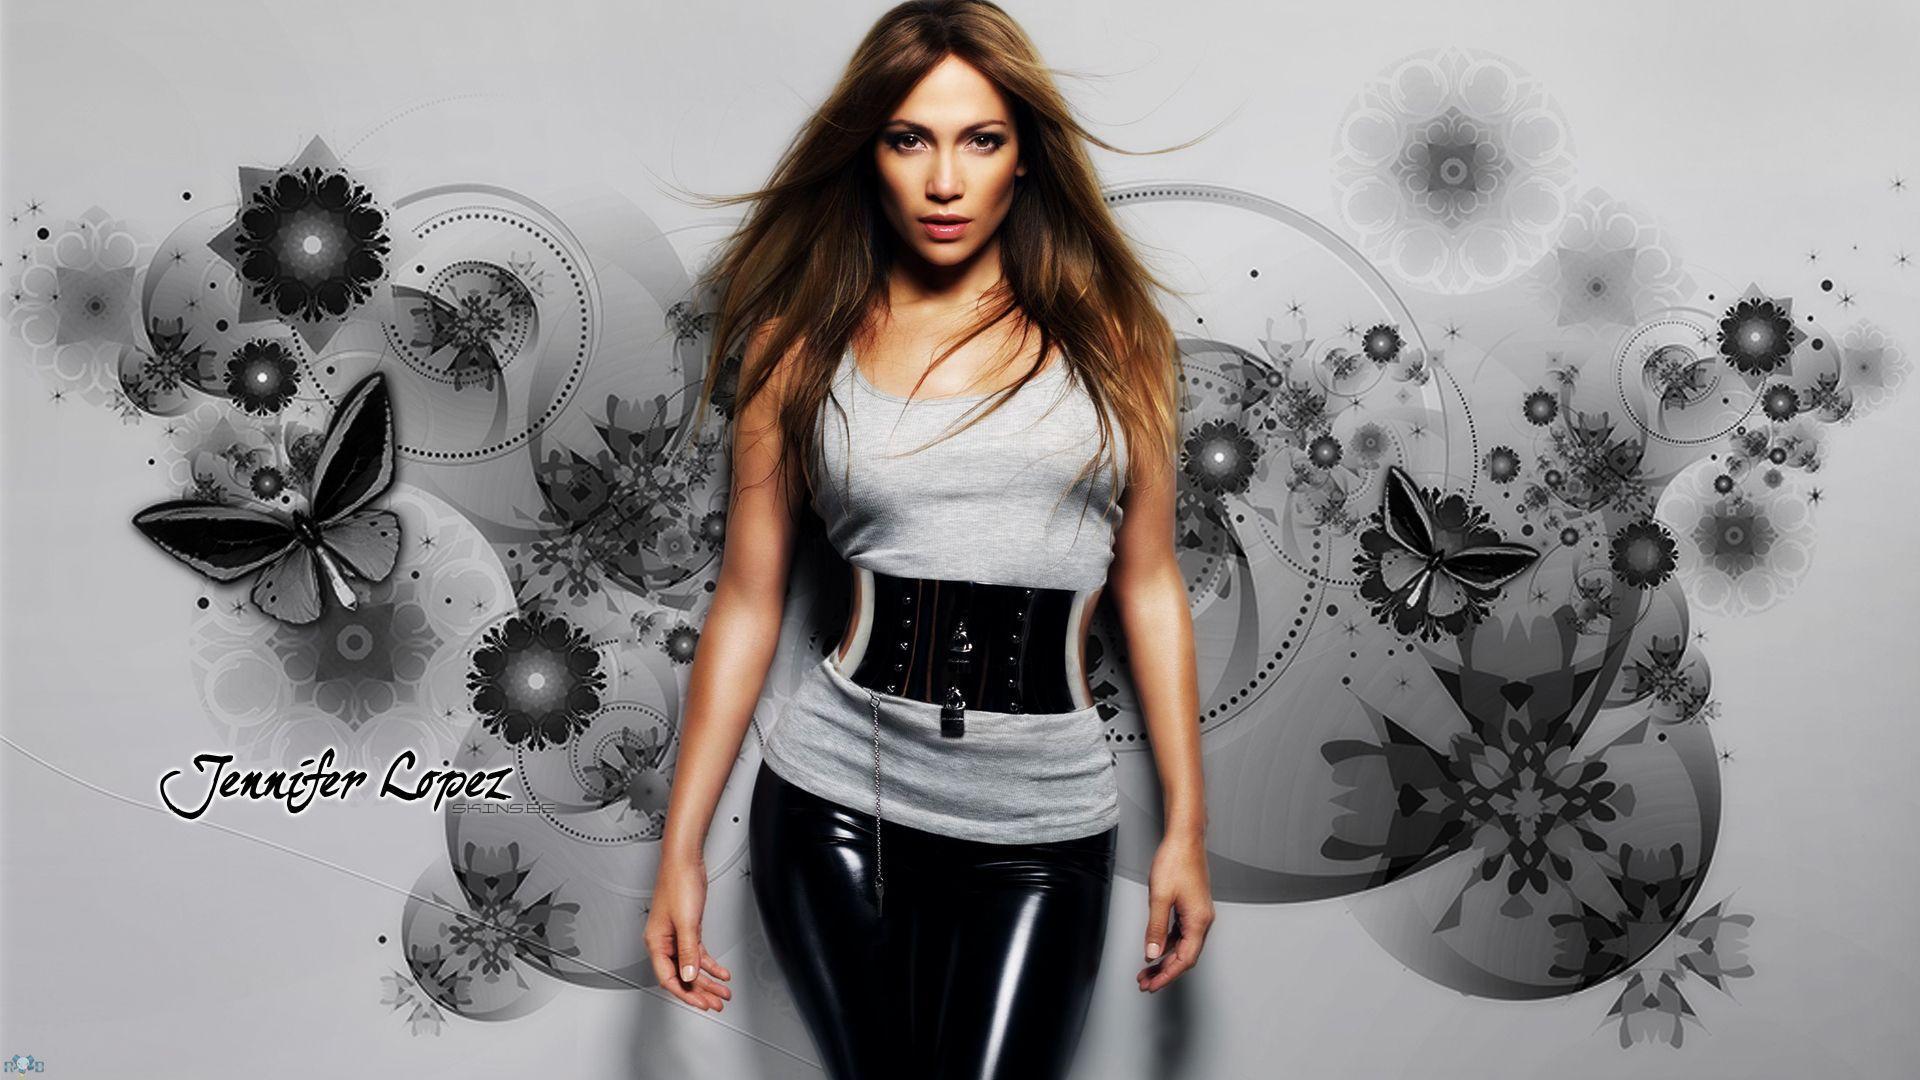 781b5220abd Jennifer Lopez Wallpapers 2015 - Wallpaper Cave